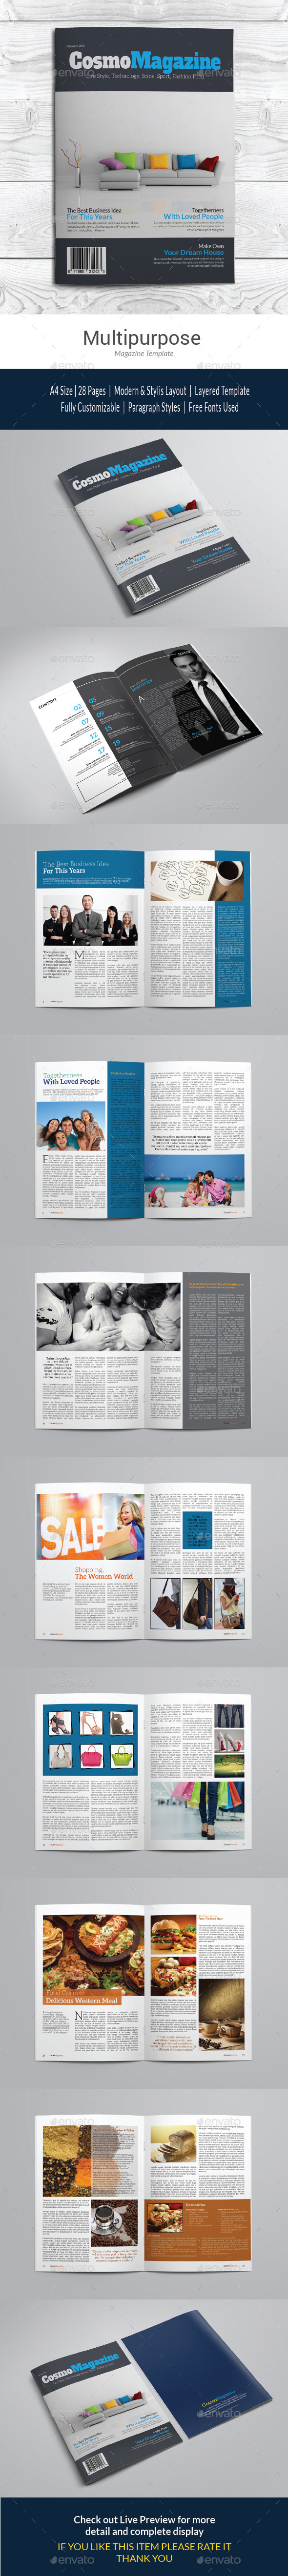 Multipurpose Cosmo Magazine Template - Magazines Print Templates